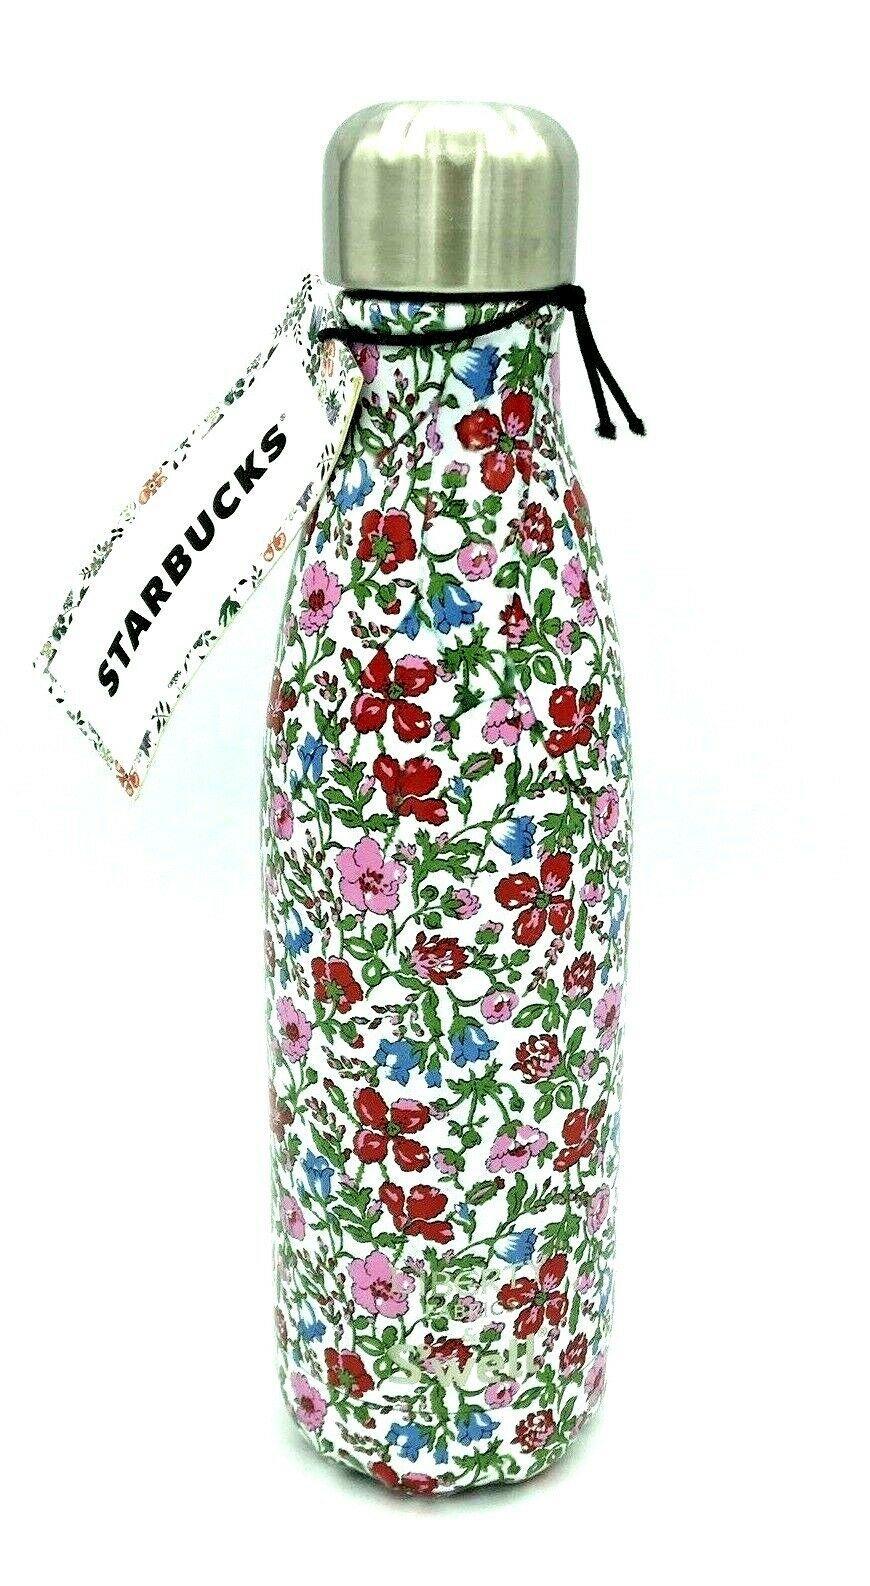 Starbucks Liberty of London Swell Fabric Water Bottle 17oz Red Flowers Pattern - $48.49